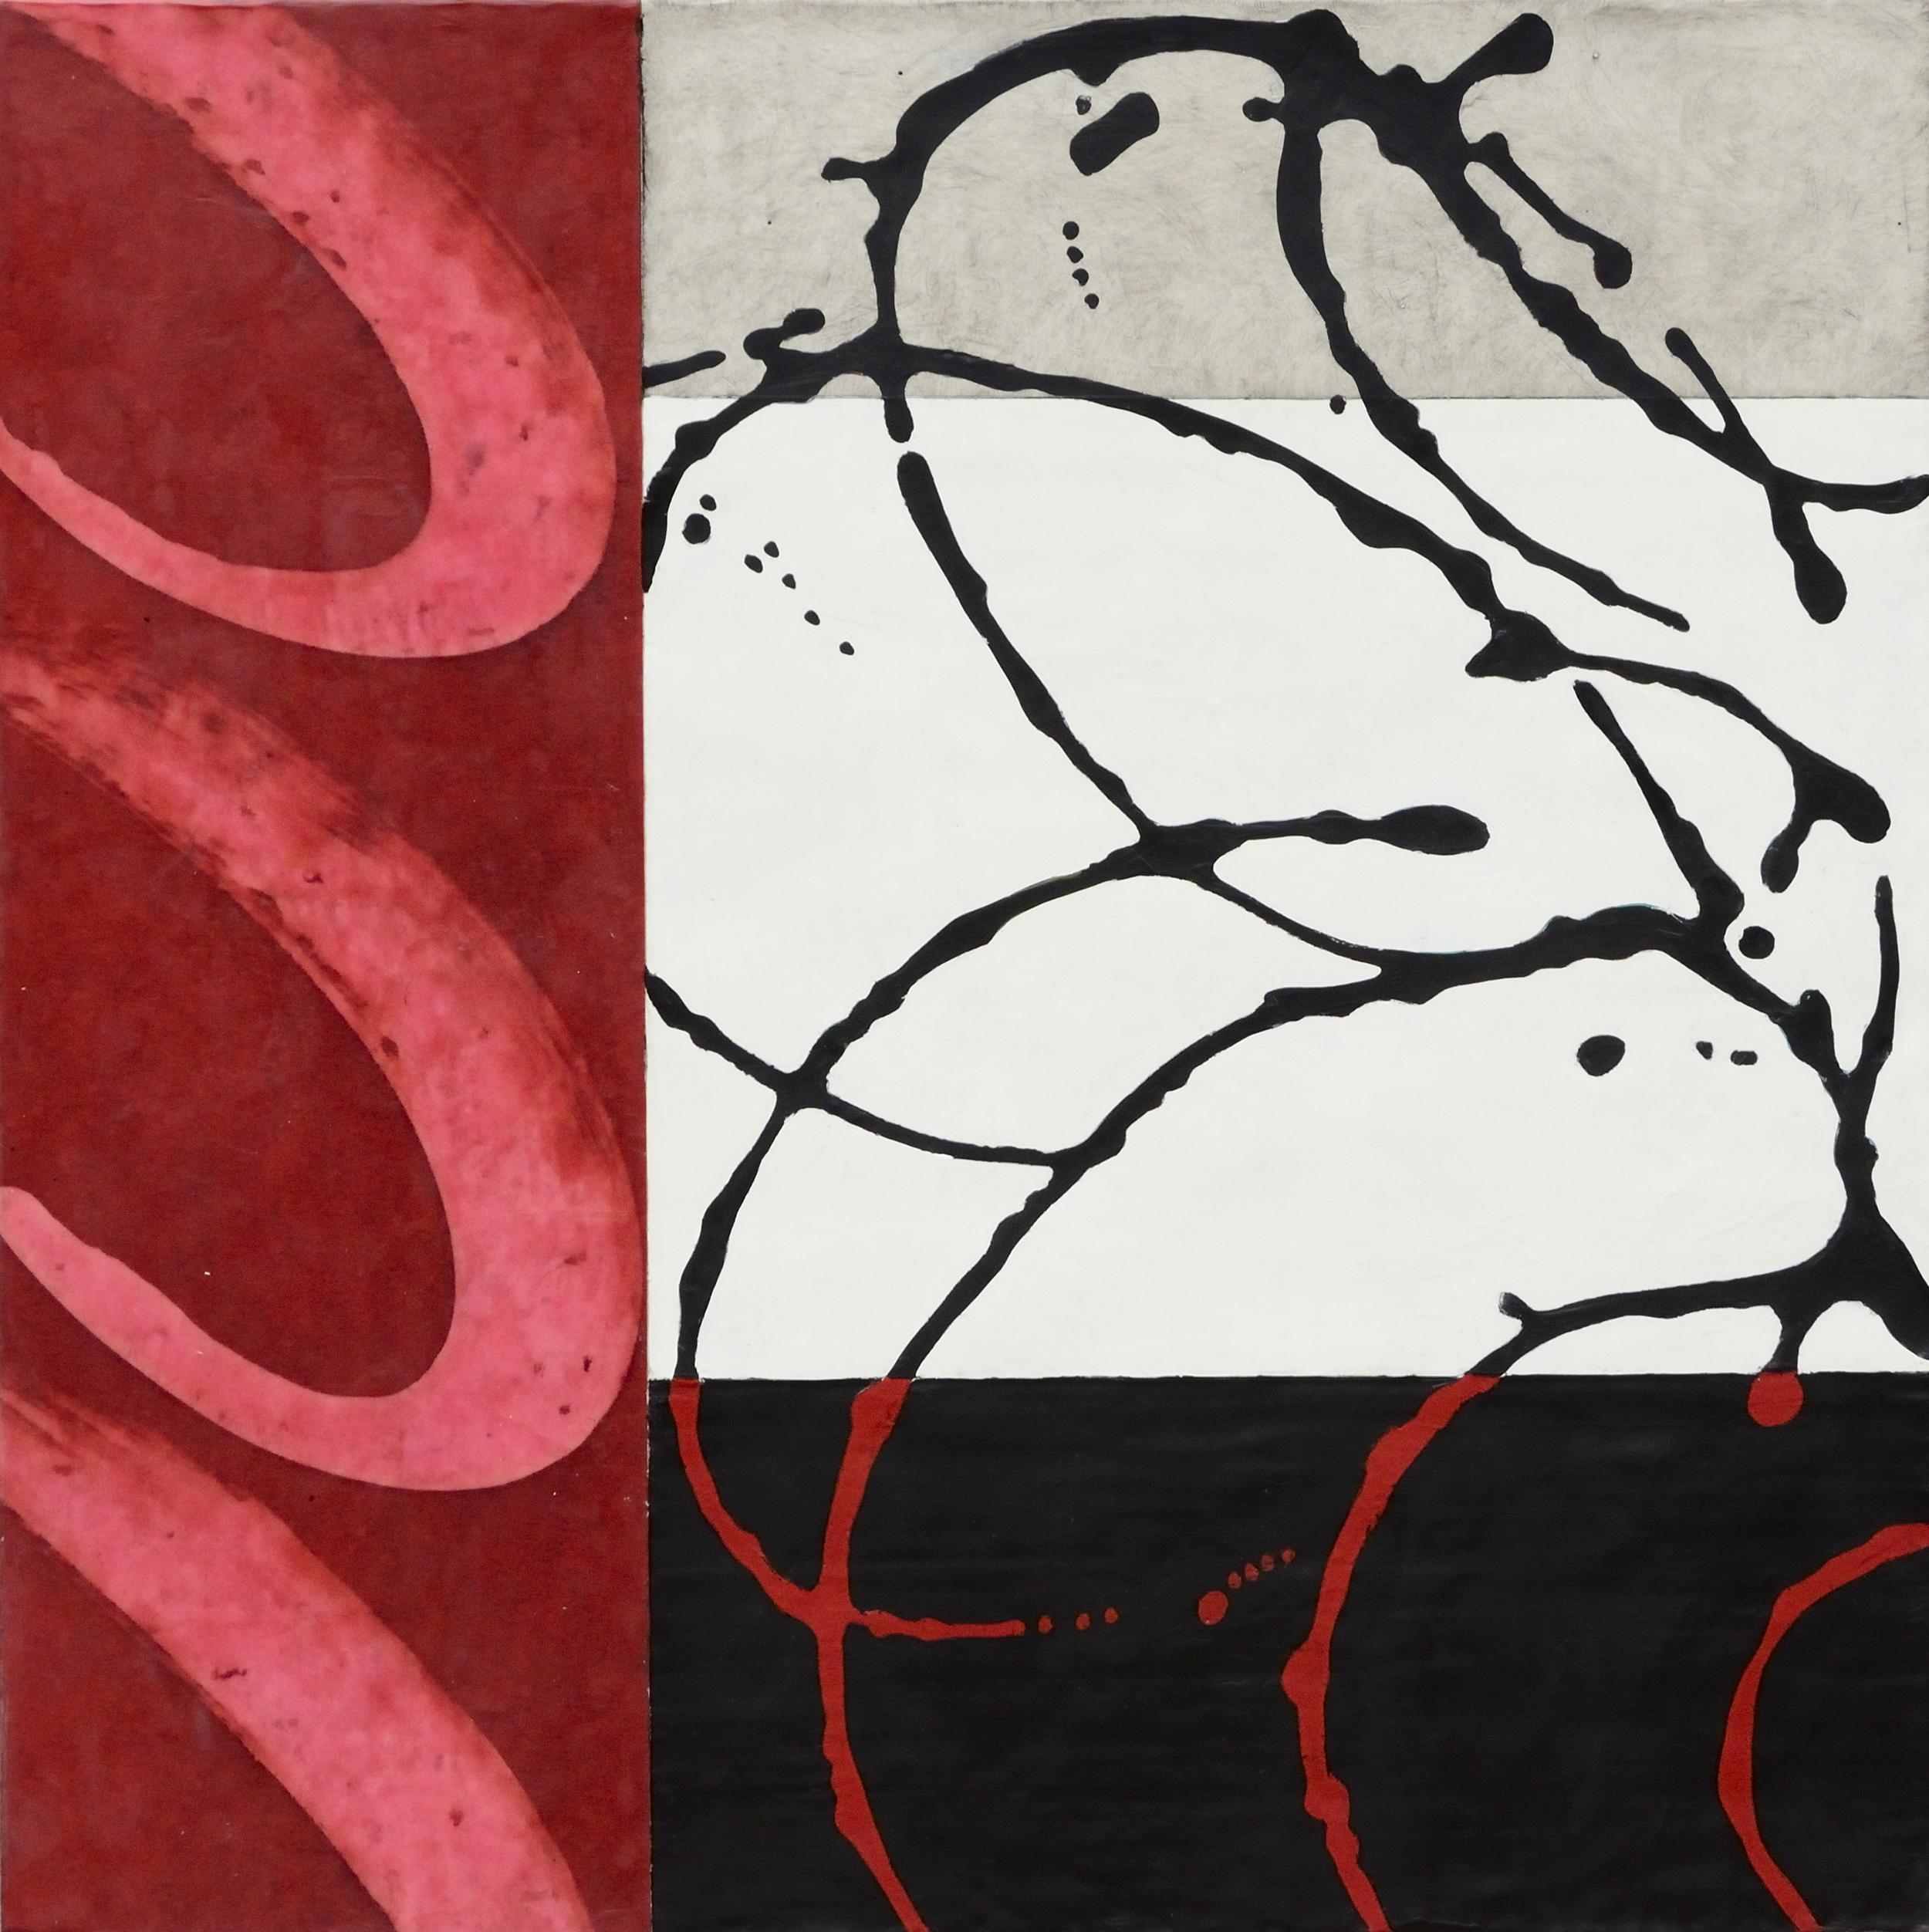 Vertiginous, Encaustic on Panel, 24 x 24